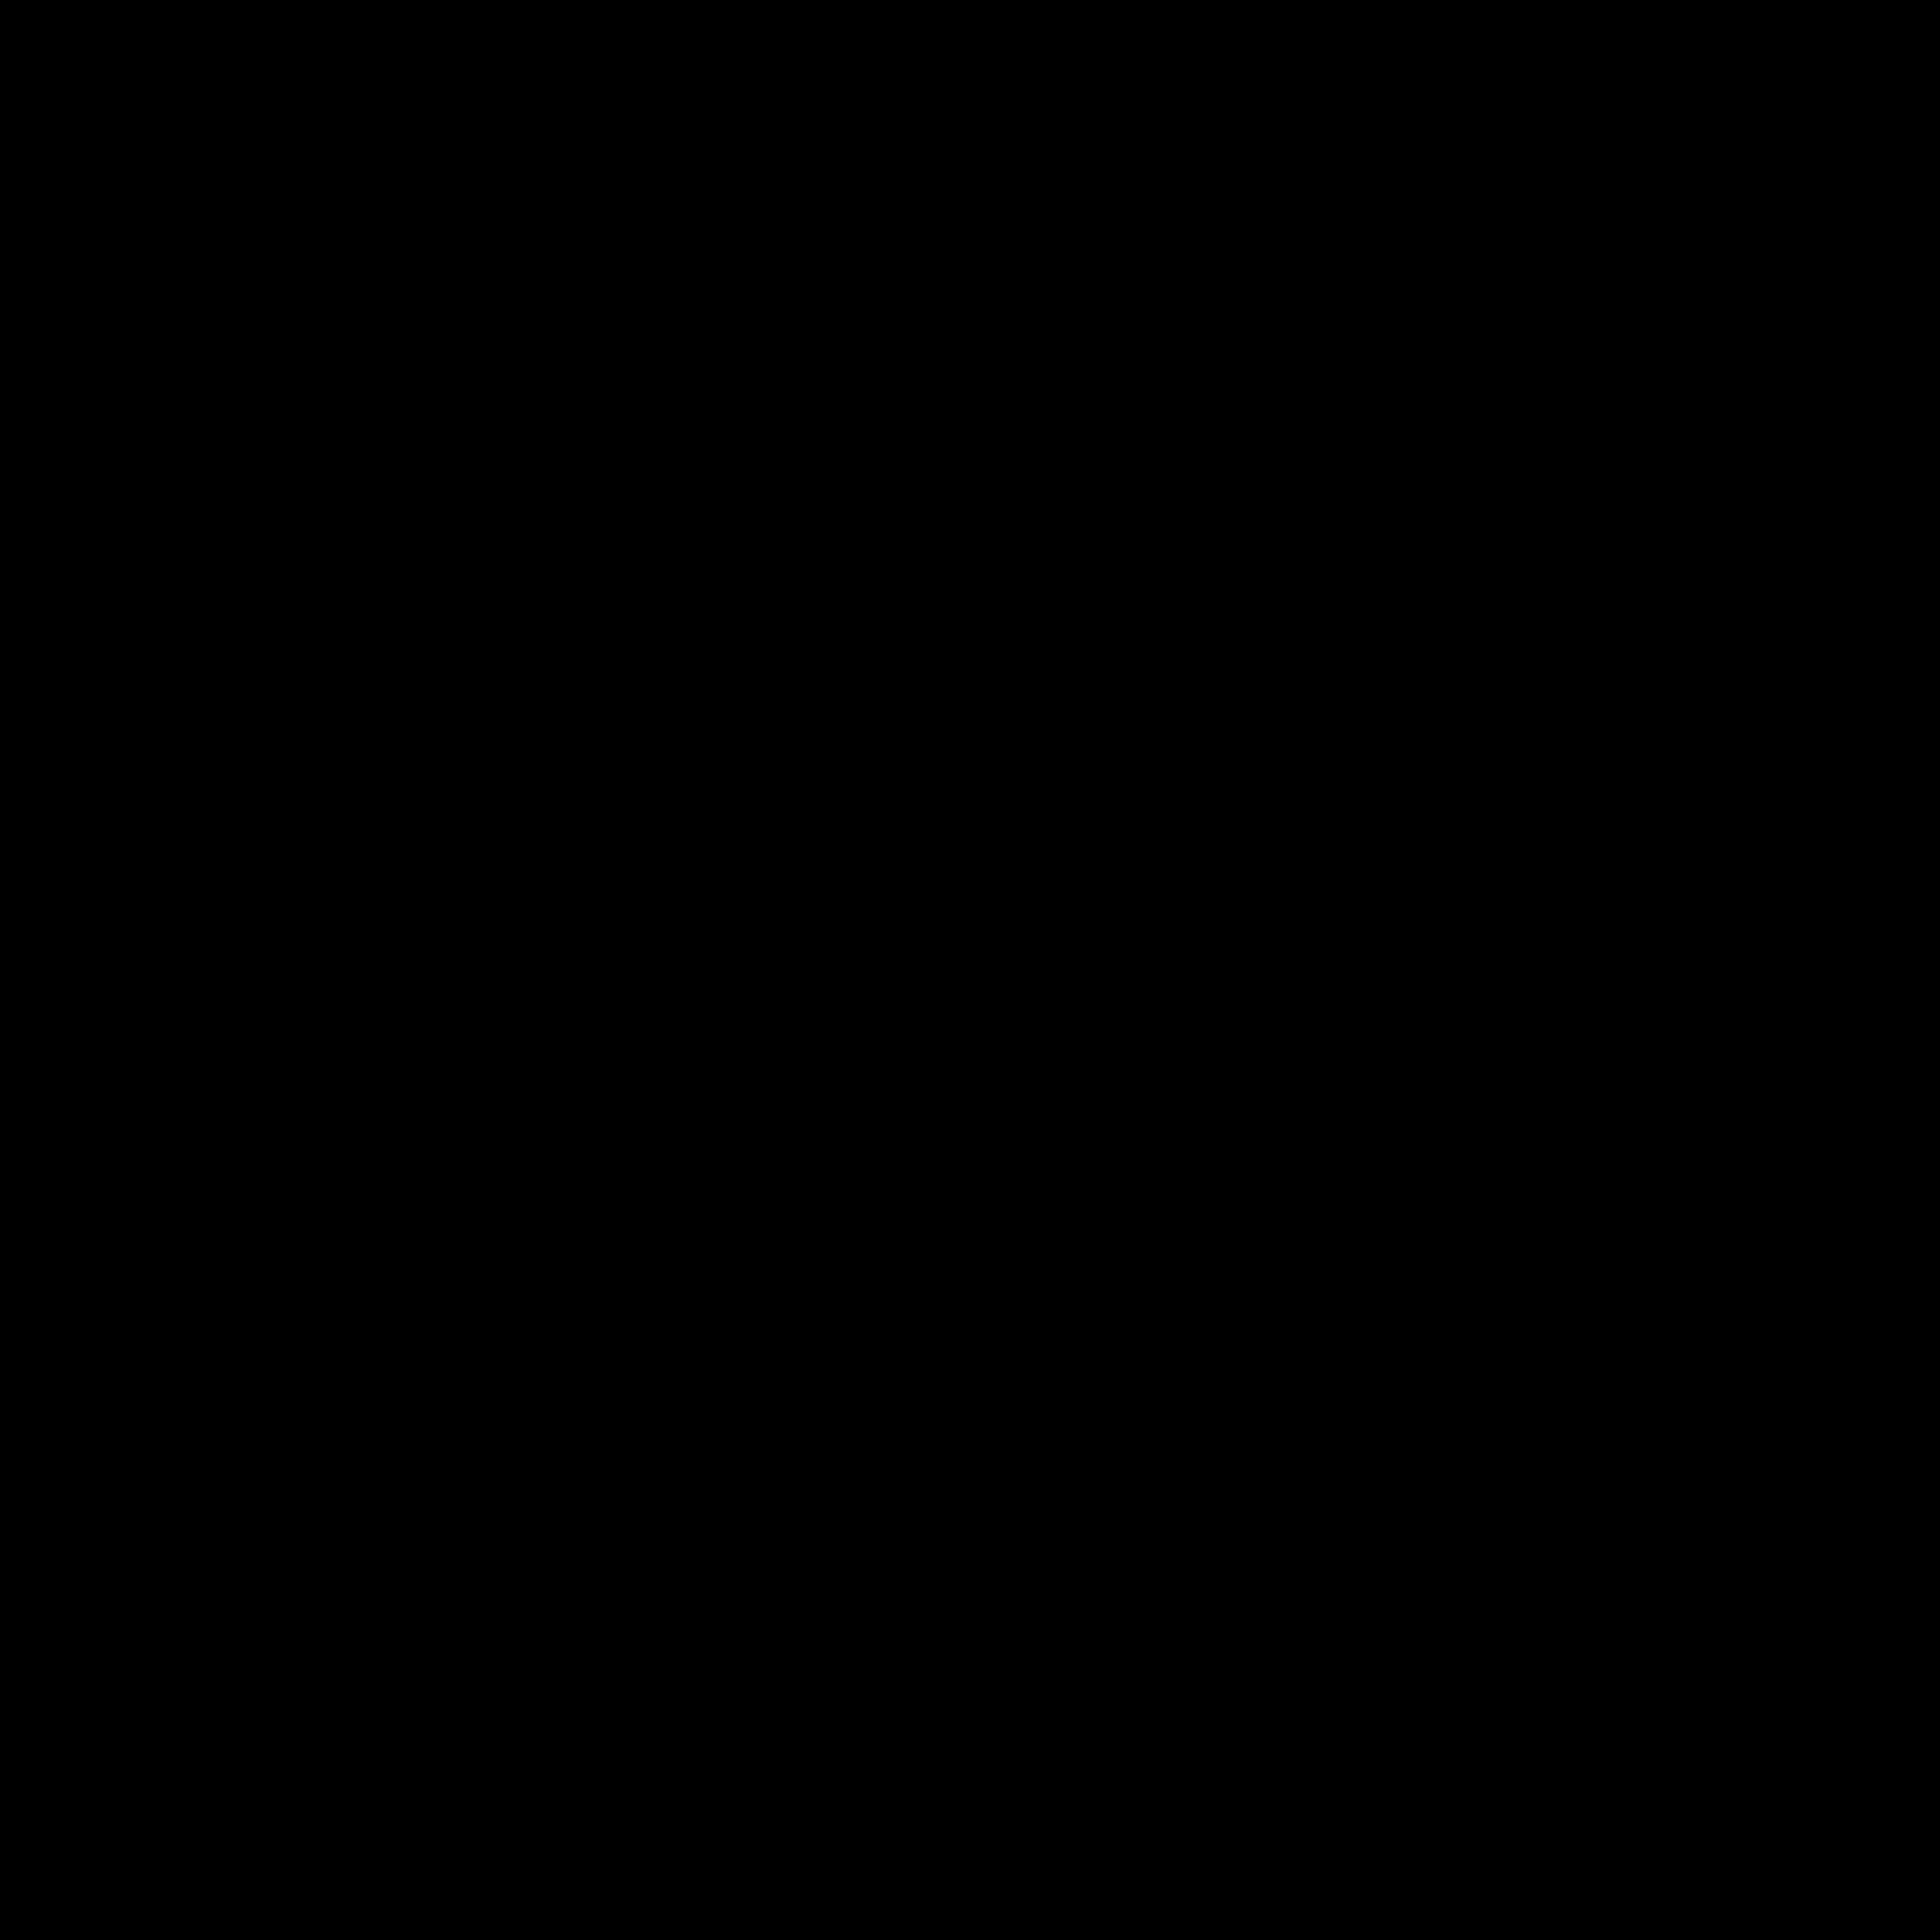 tiffany-co-logo-png-transparent.png